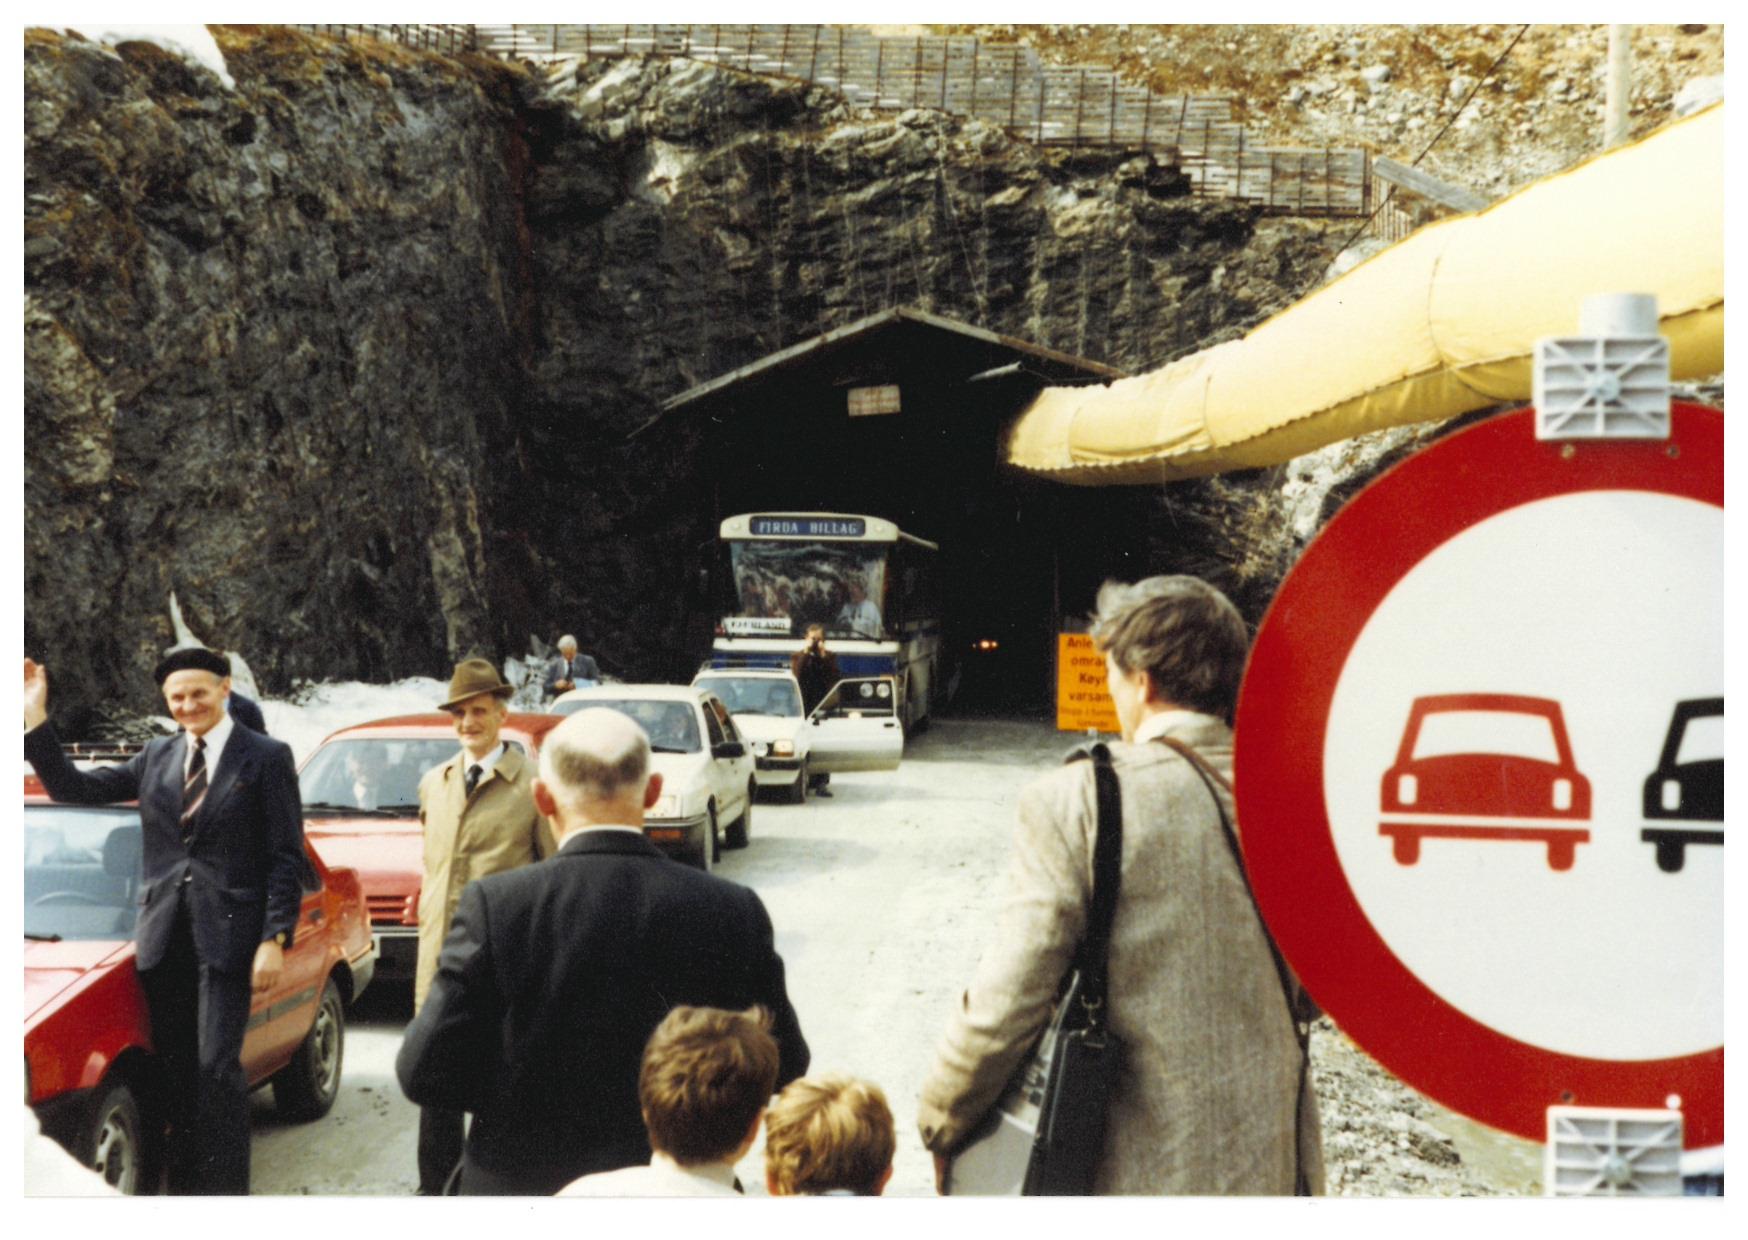 Le tunnel du Jølster, ouvert en 1986. Photo : Anders J. Bøyum.